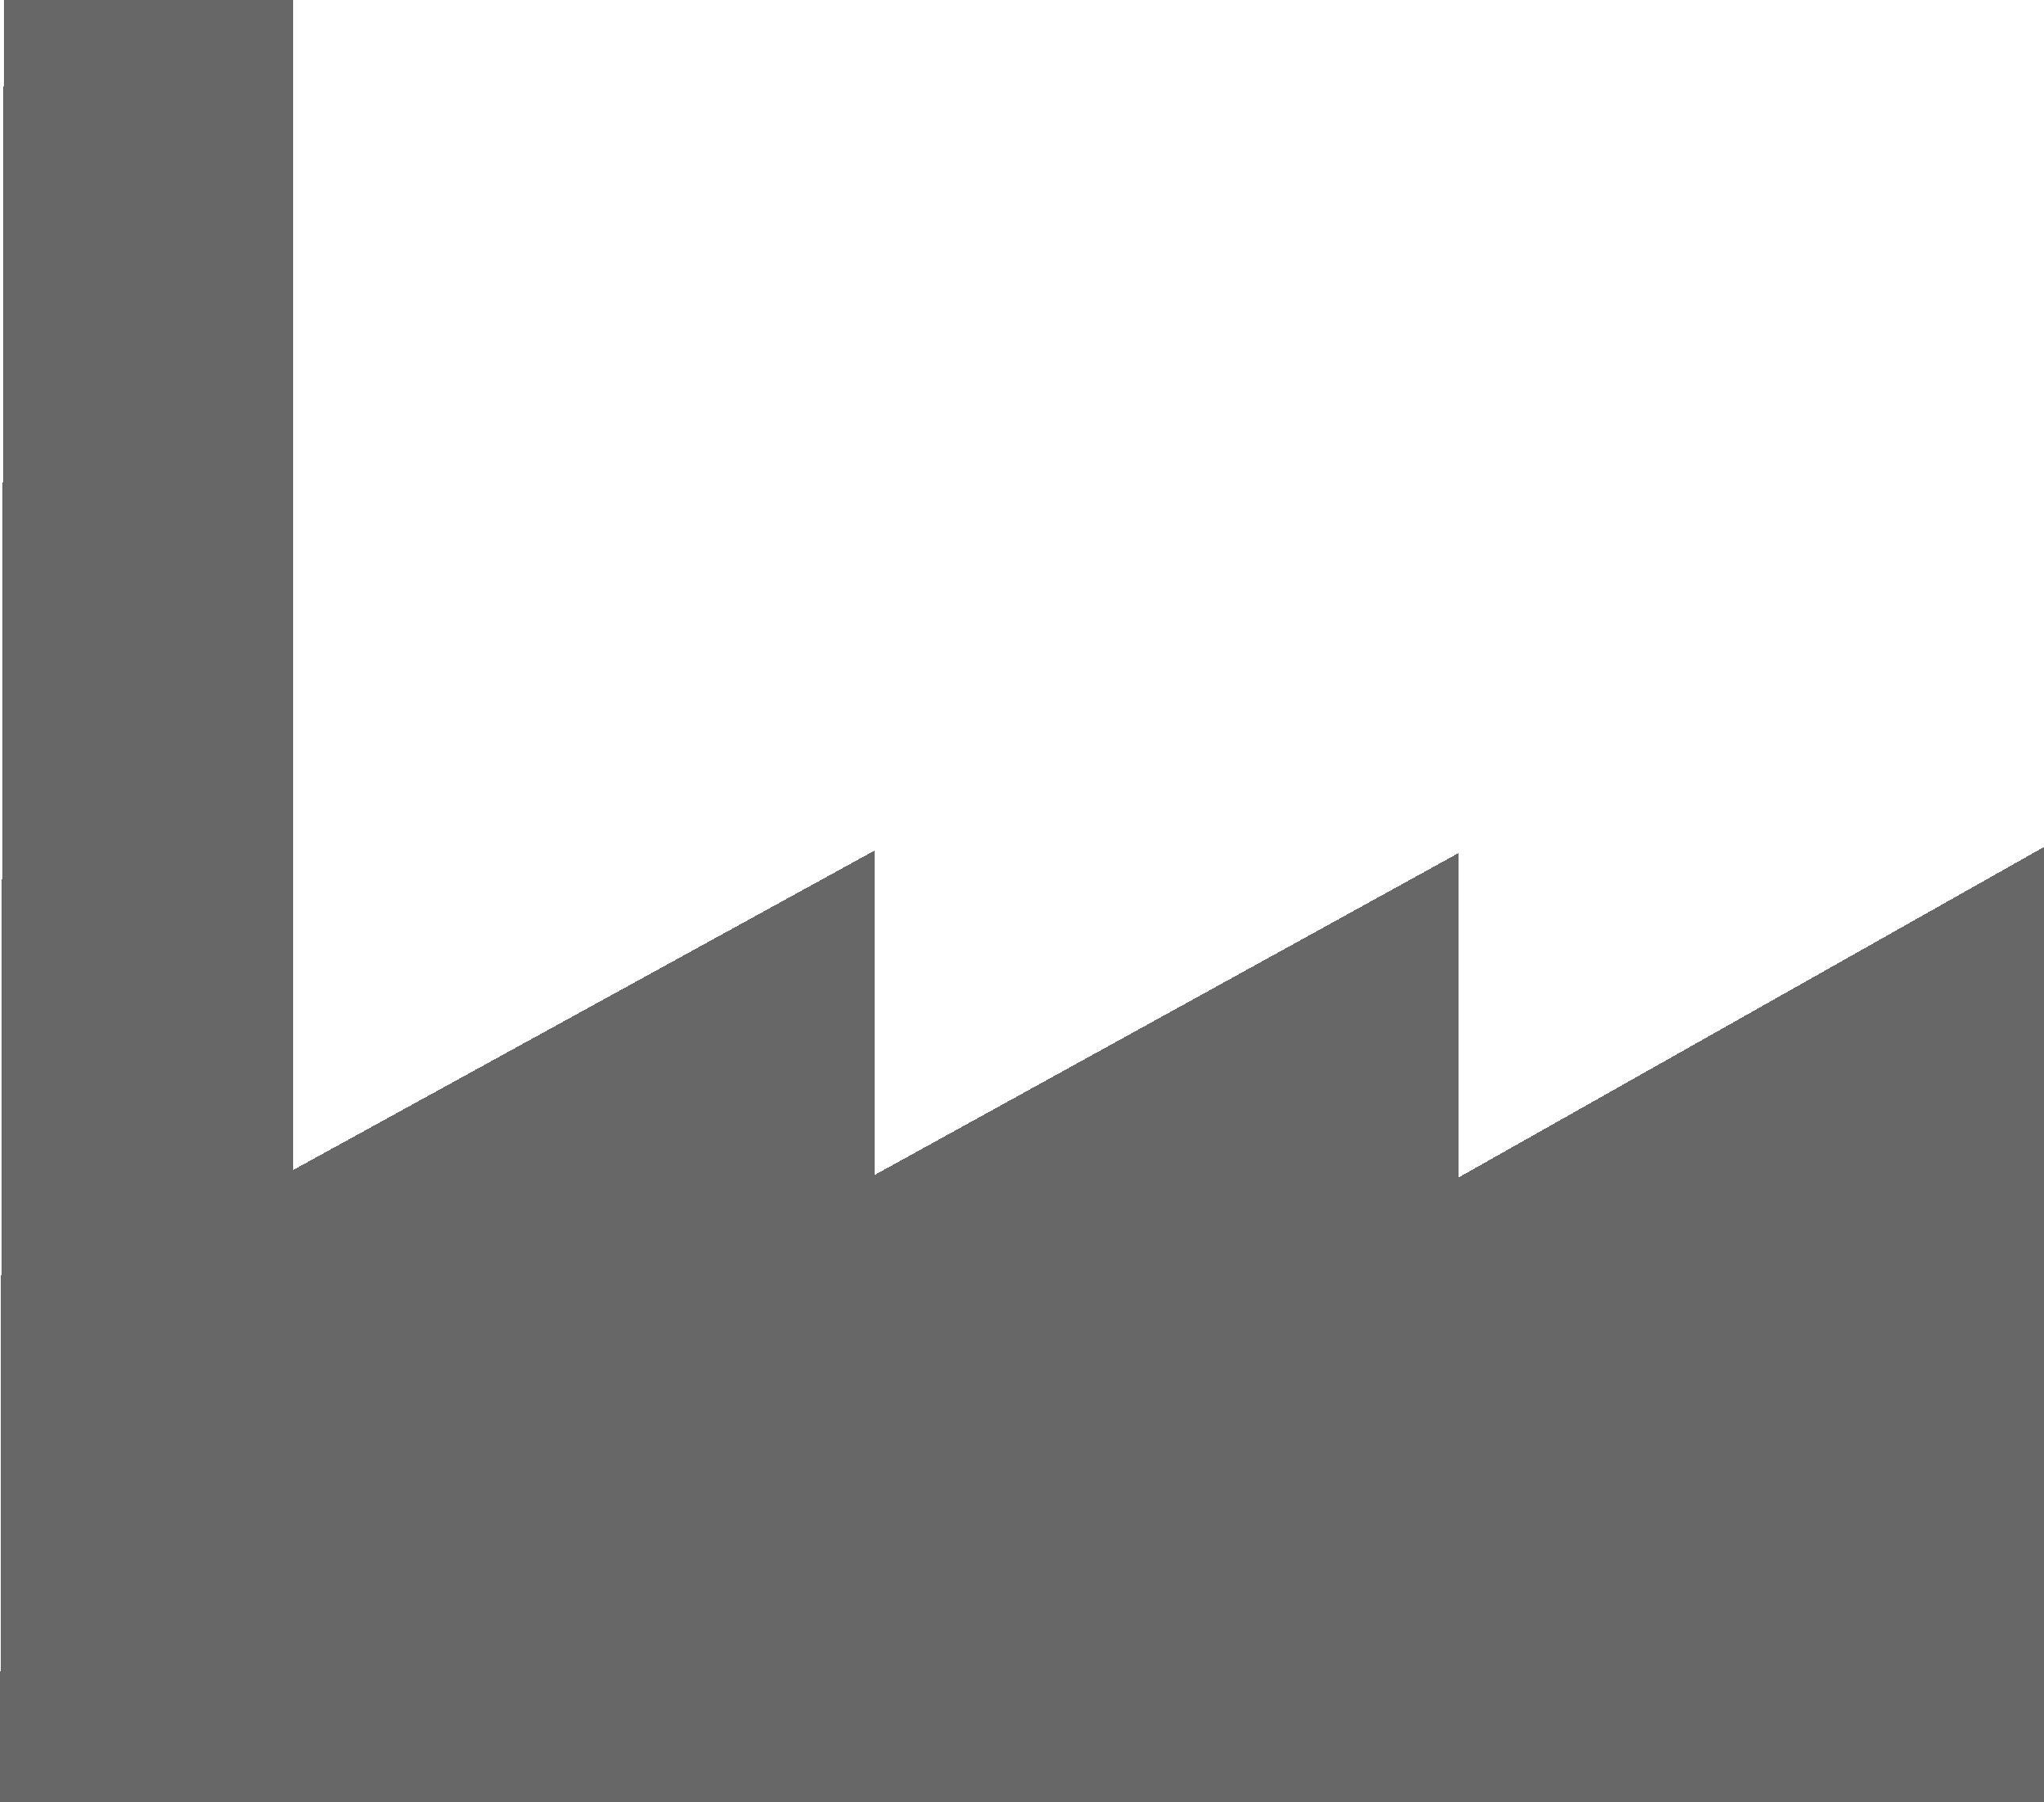 icon_industrie_grau